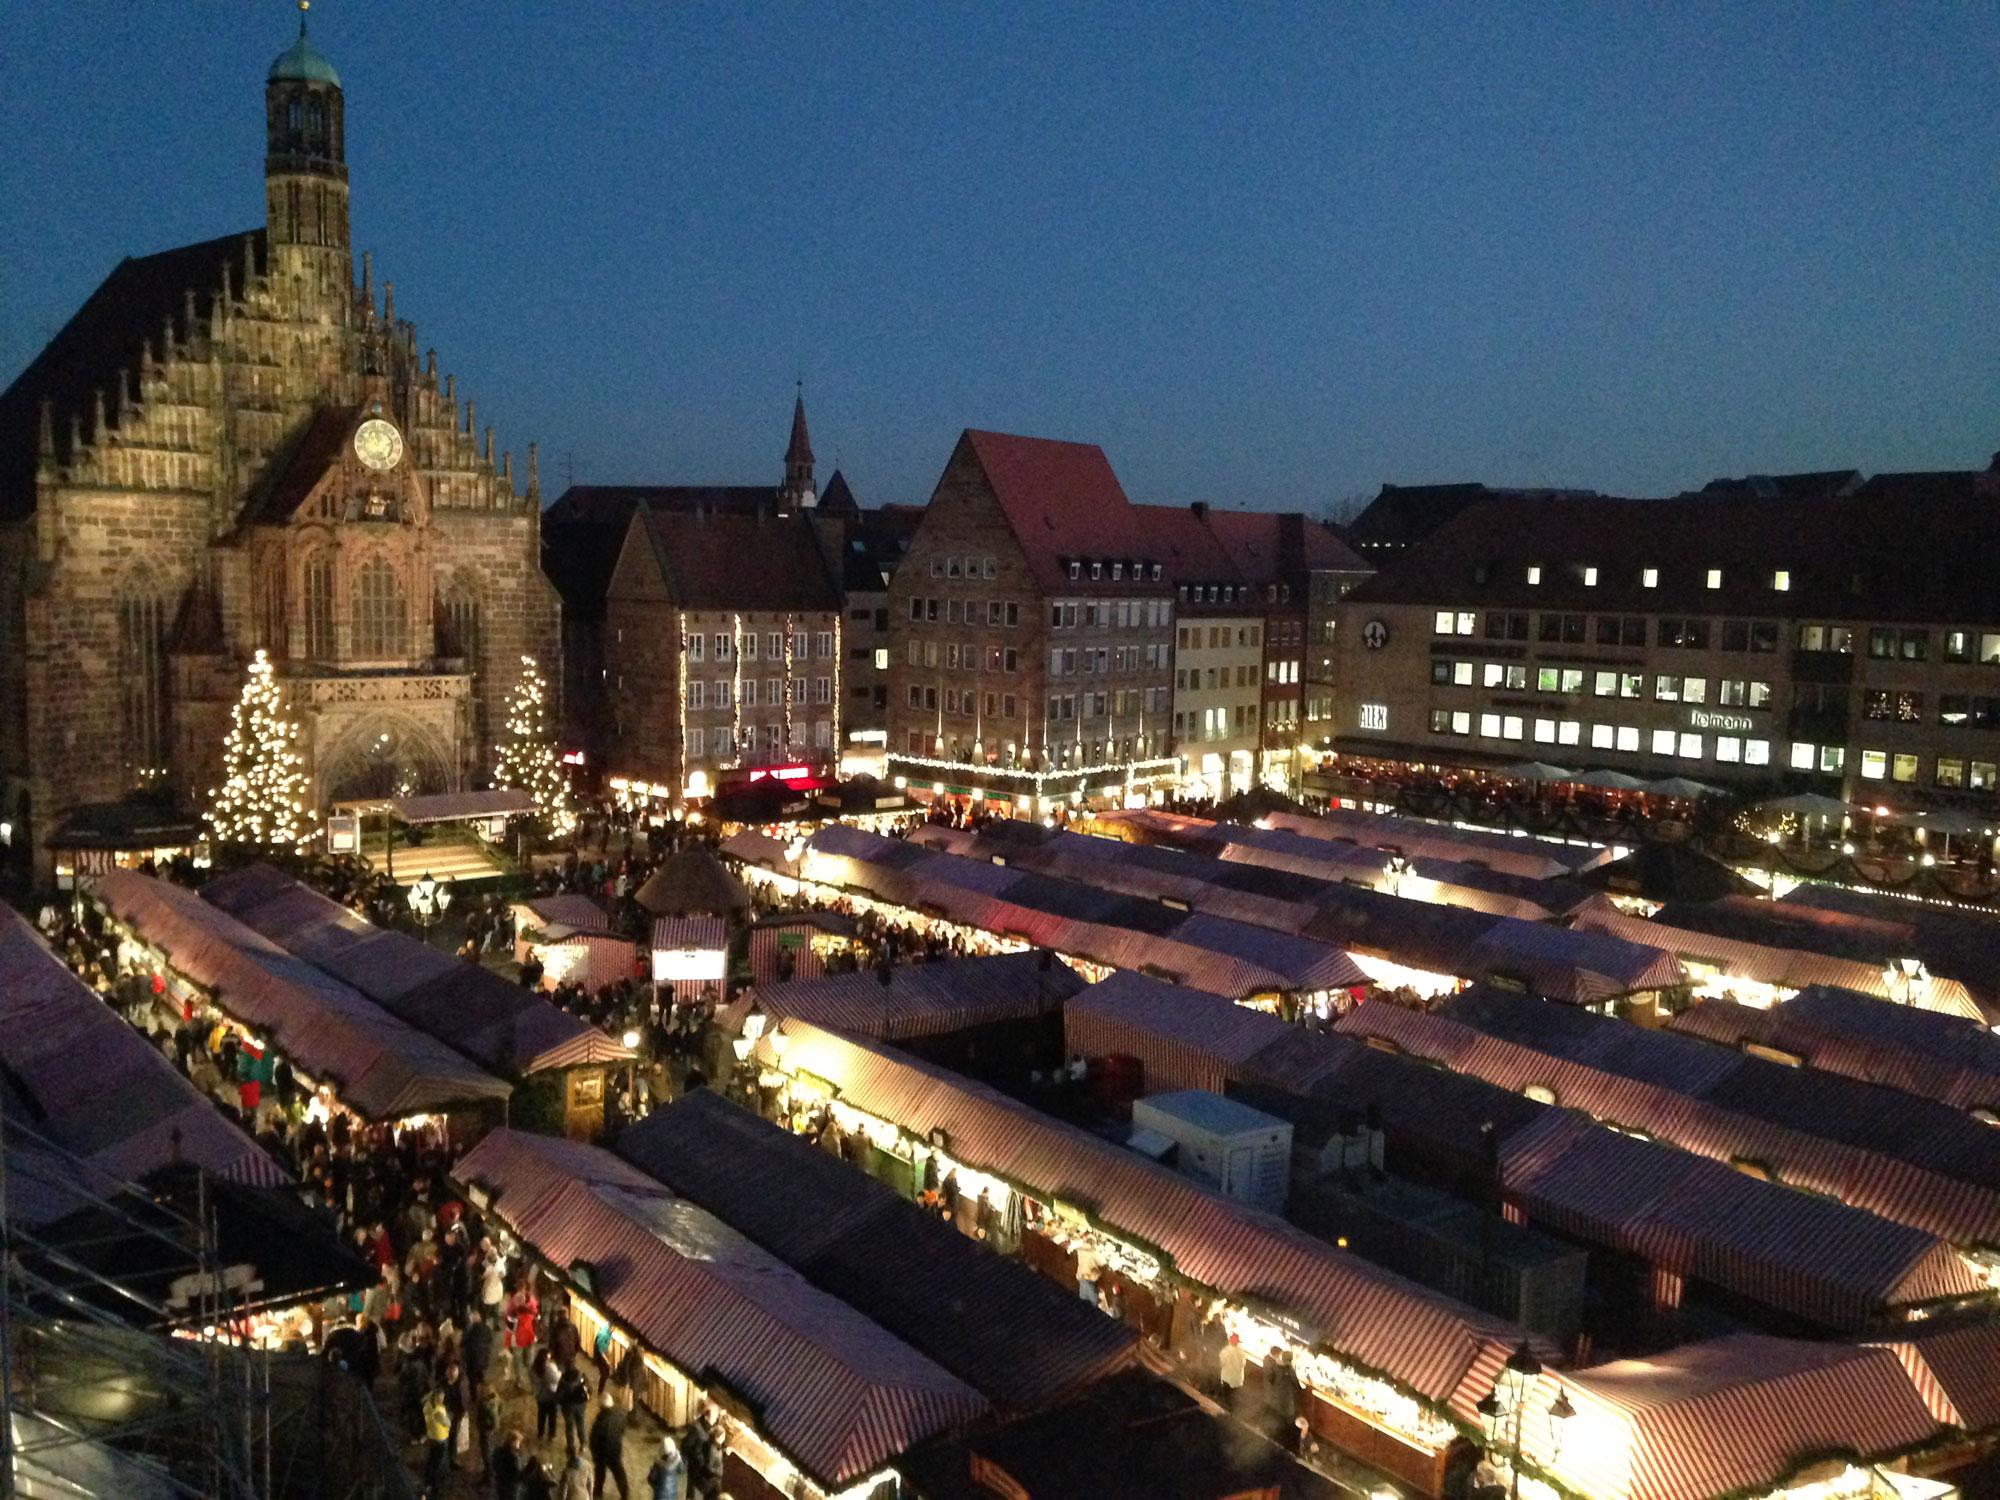 Lights illuminate the Christmas market in Nuremberg, Germany, on Dec. 7, 2015. 680 NEWS/Patricia D'Cunha.